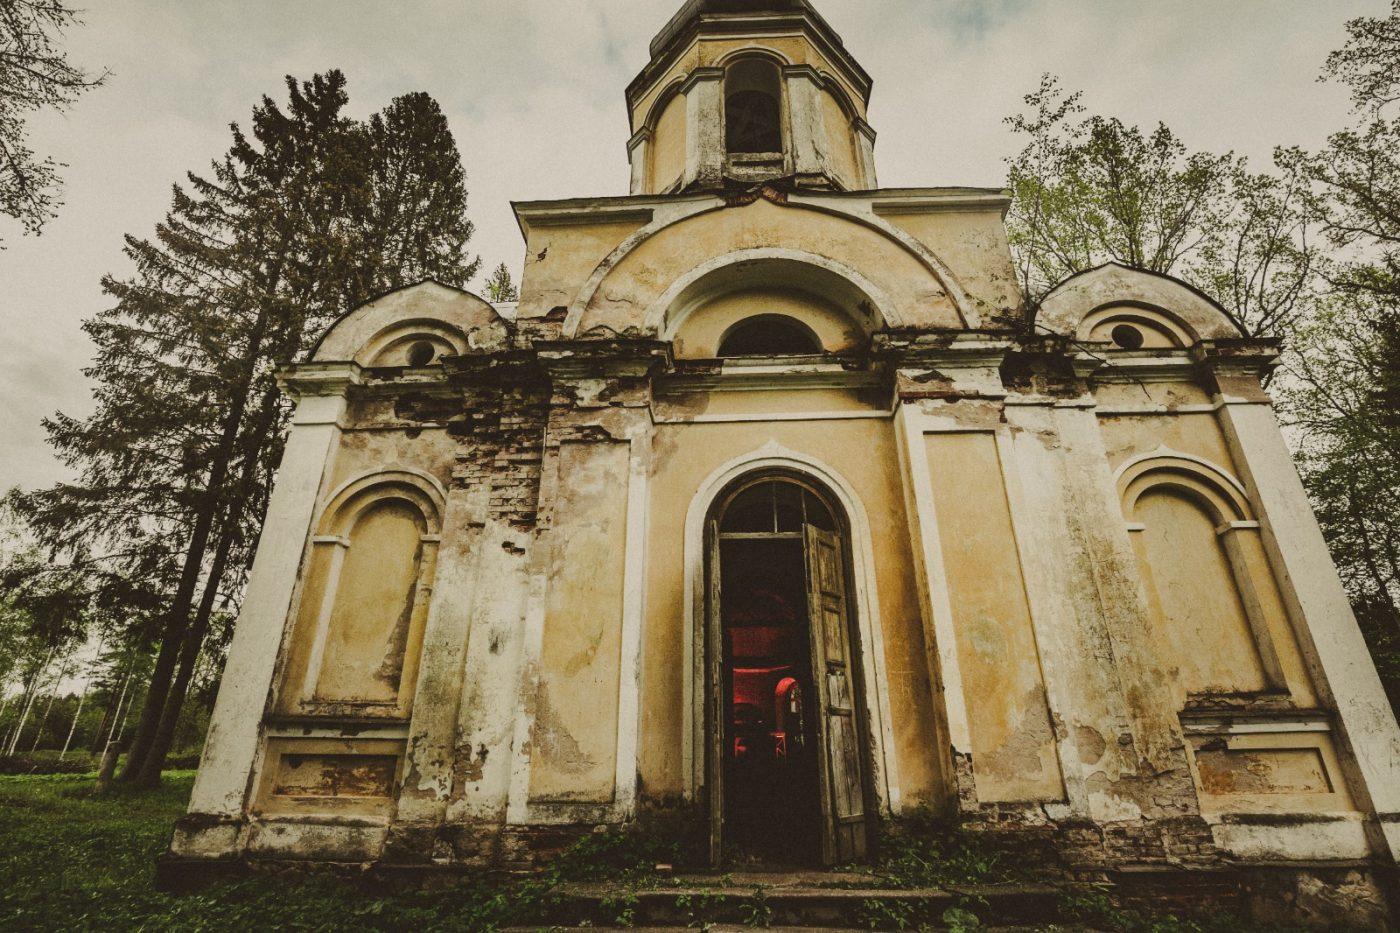 RTS.FM и клуб One One проведут стрим из церкви Святого Иоанна Крестителя